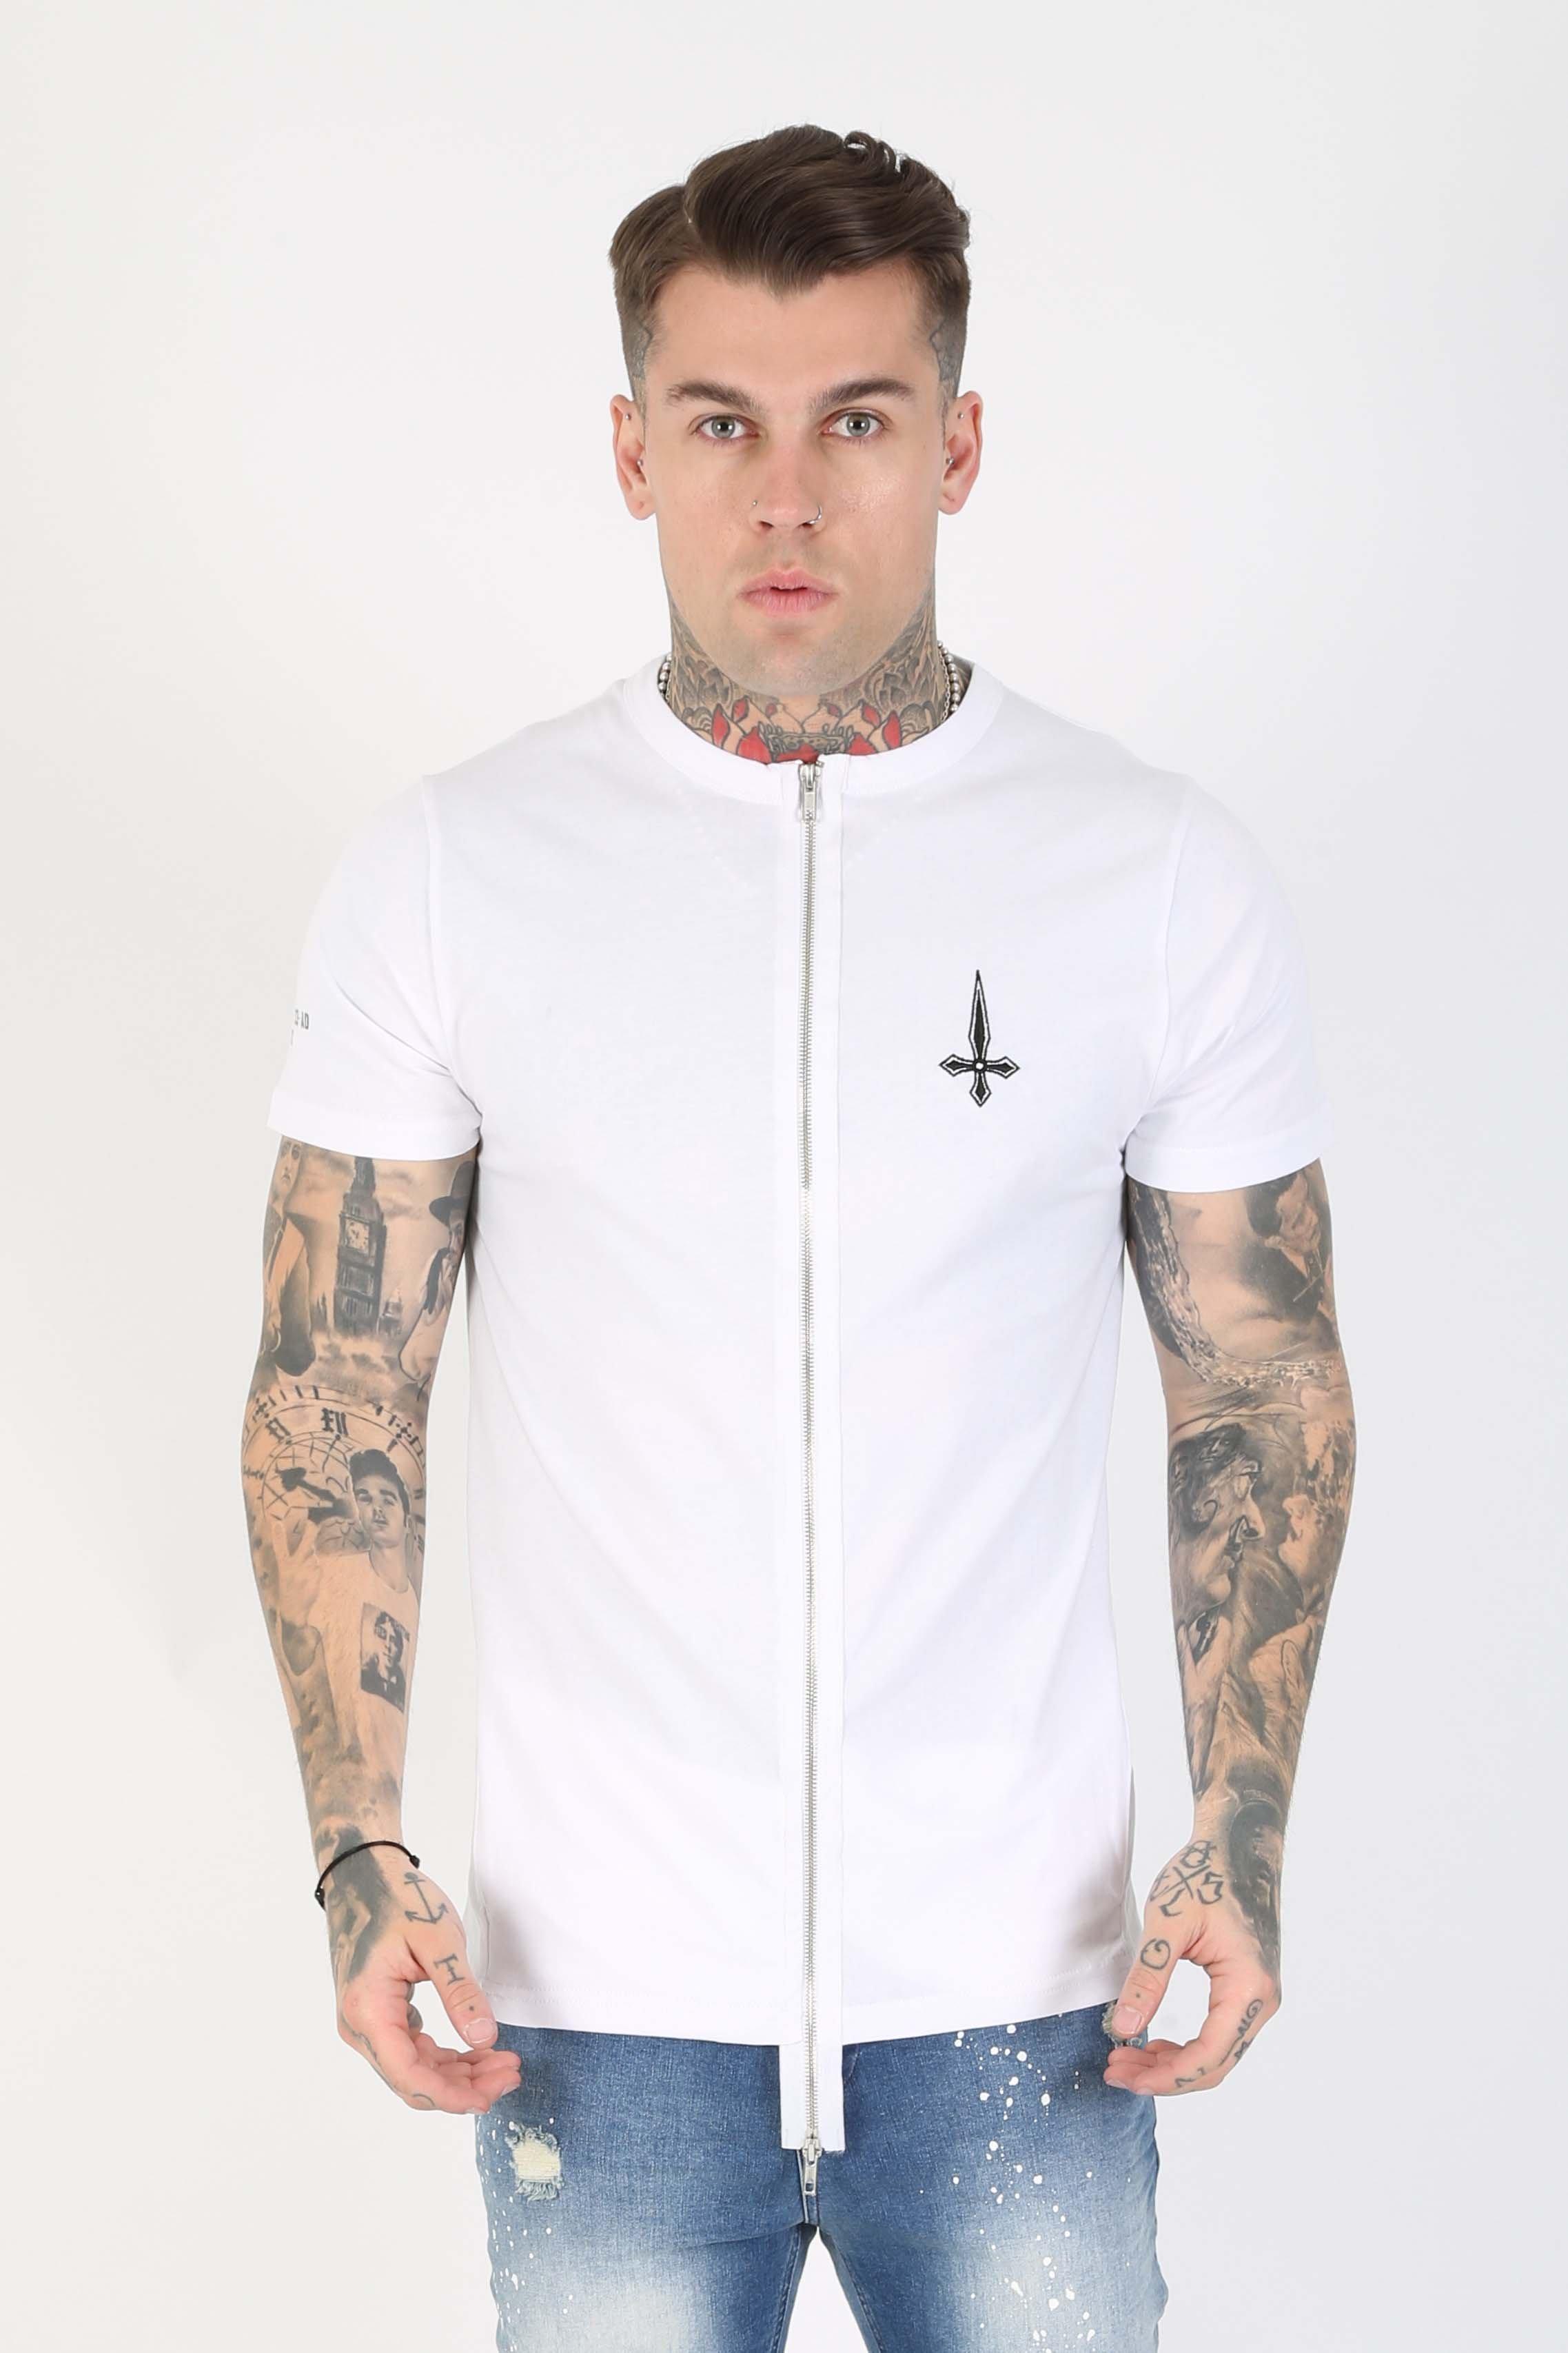 Blitz Zip Front Utility Men's T-Shirt - White, Medium